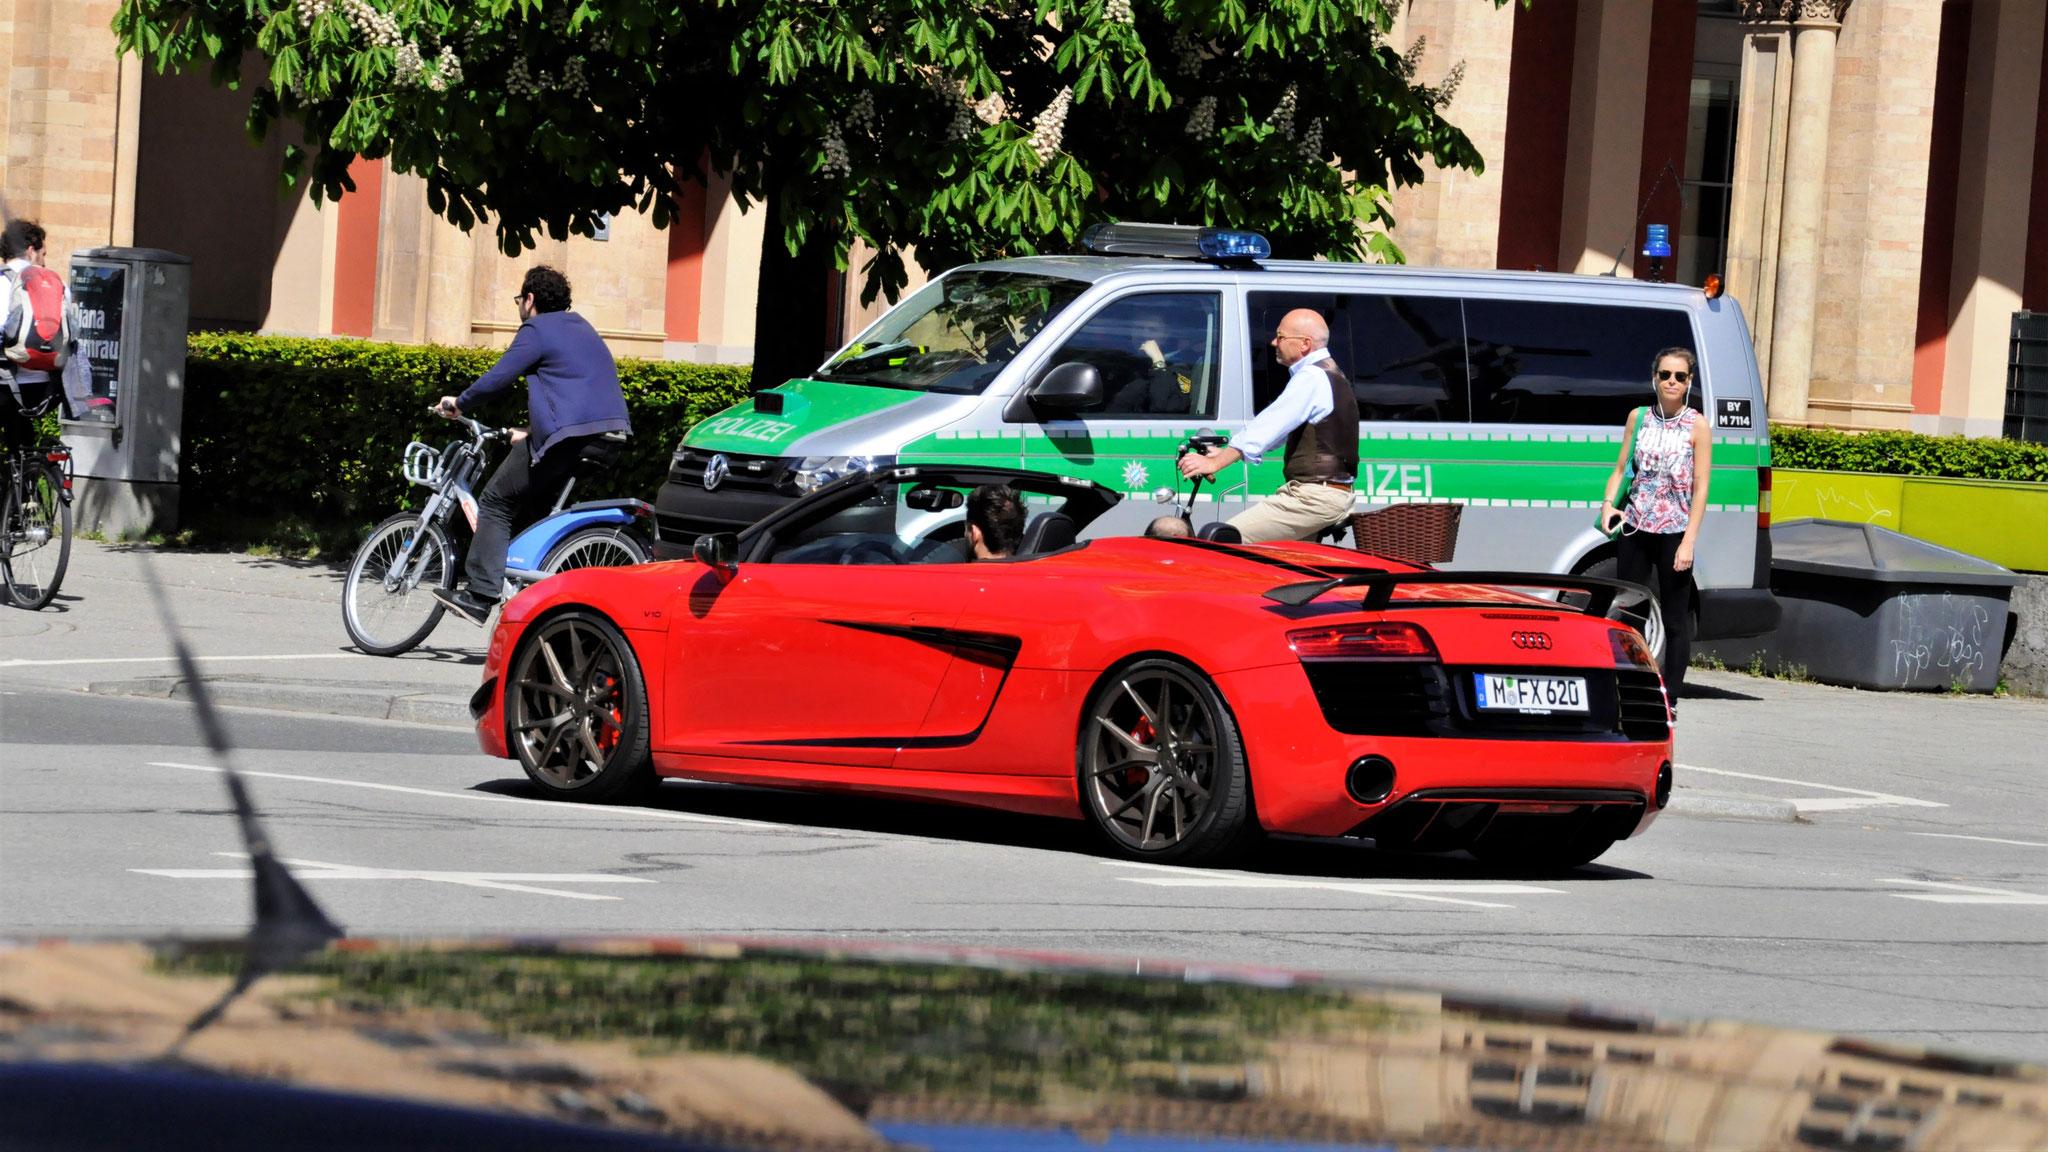 Audi R8 Spyder - M-FX-620